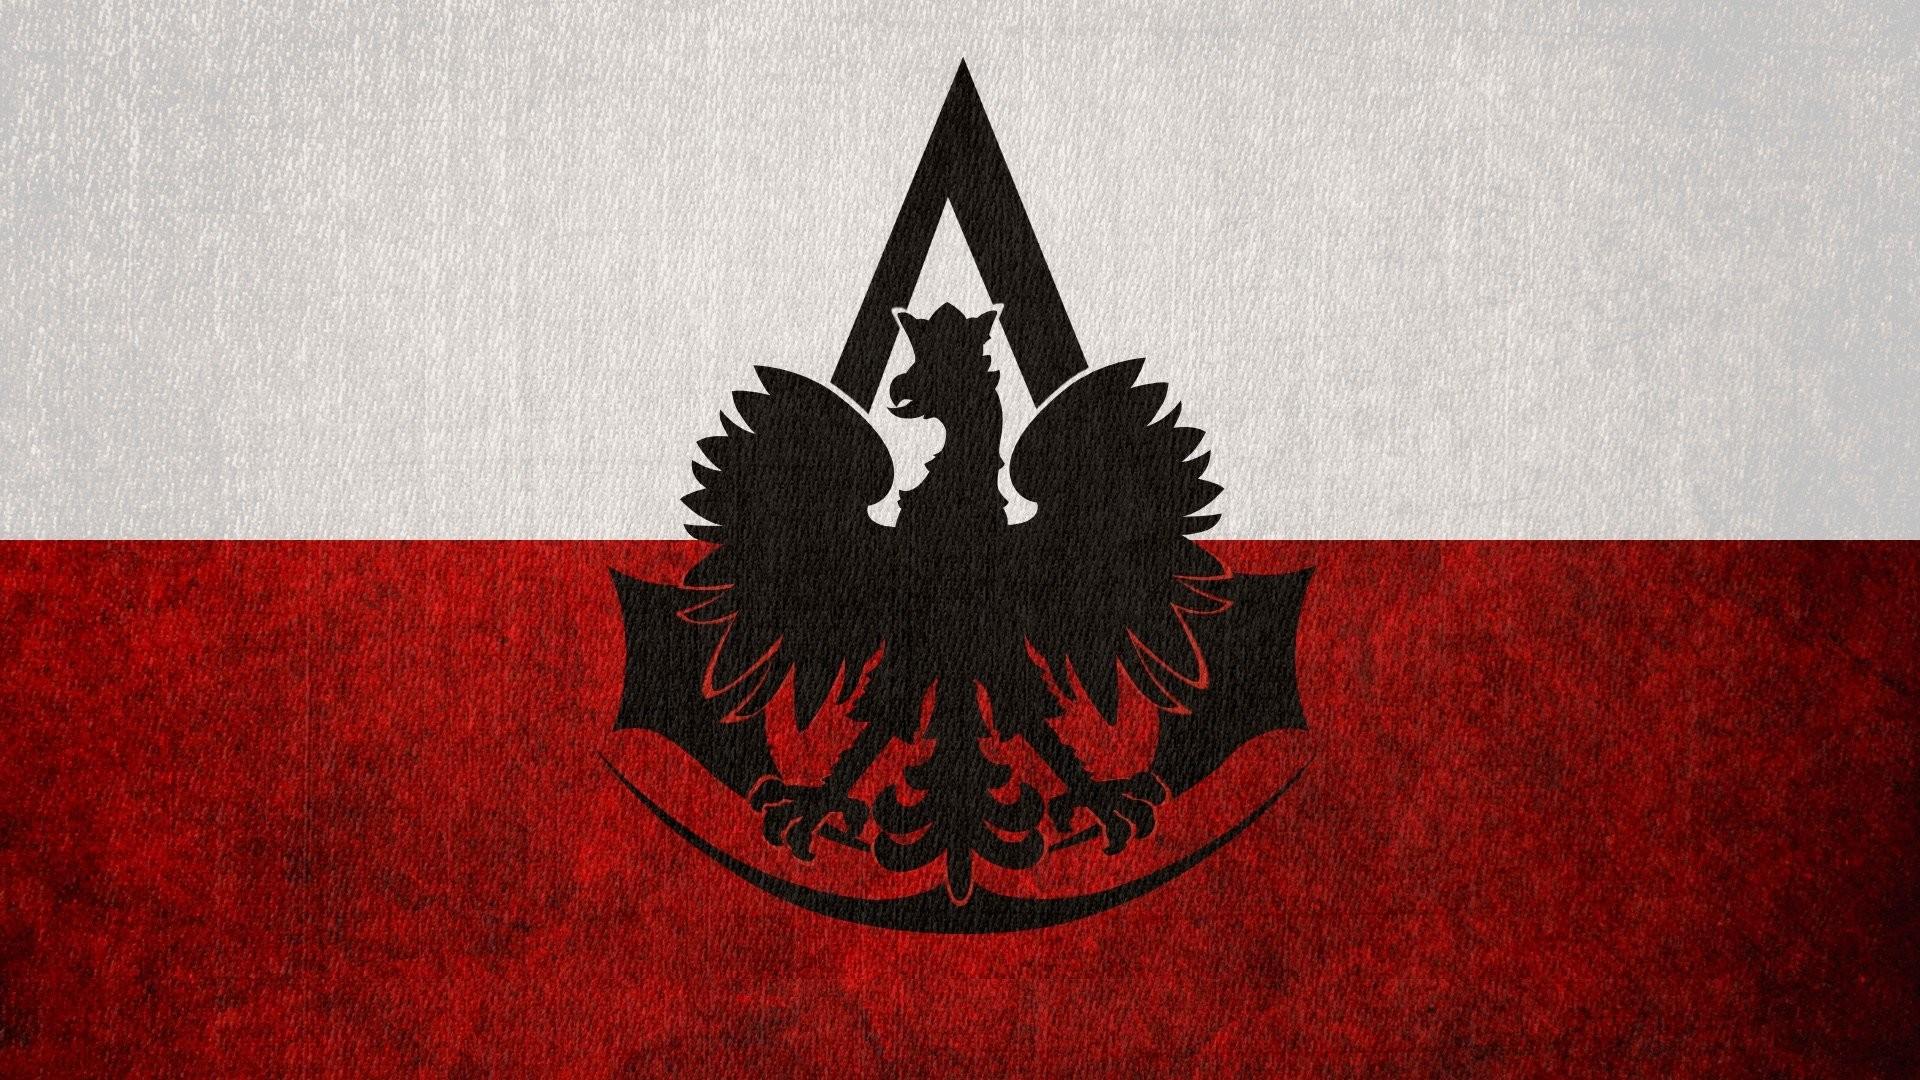 Assassins Creed flags Poland logos Polish Flag Polish eagle wallpaper |  | 323928 | WallpaperUP